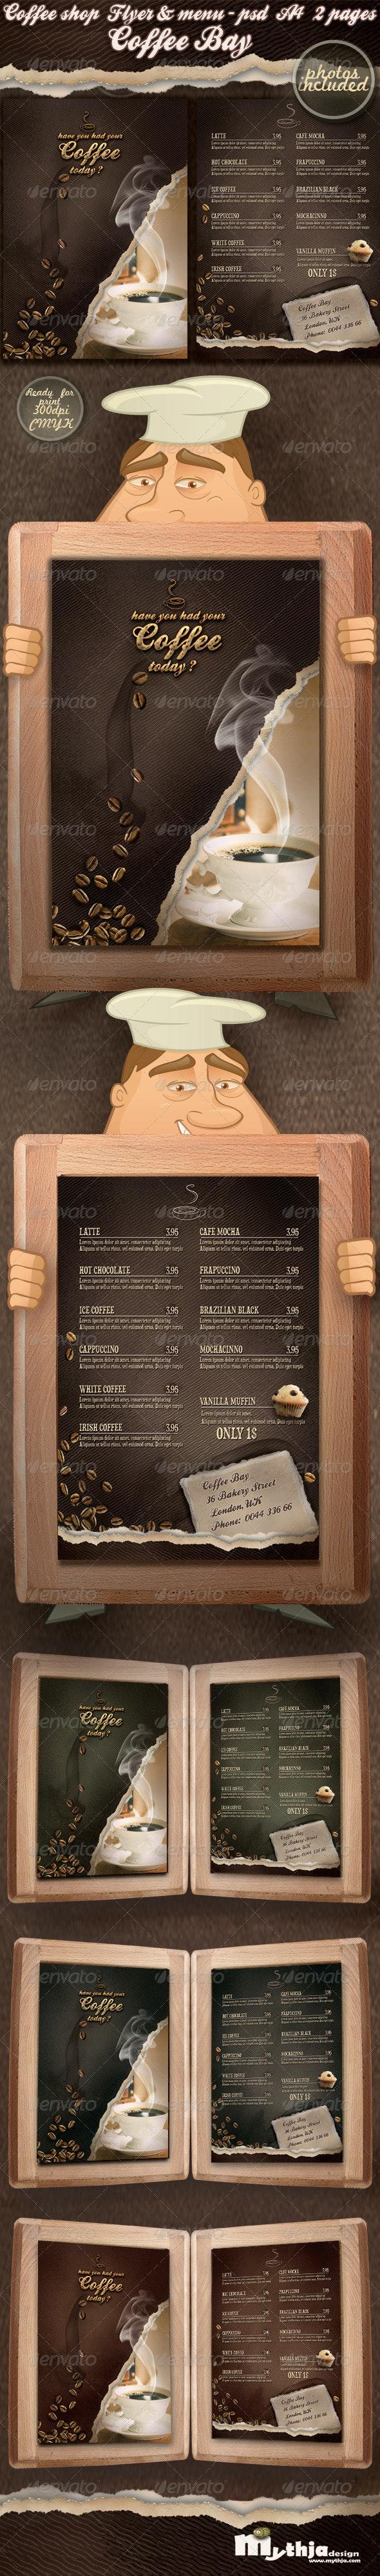 Coffee shop flyer & menu - photos included  - Food Menus Print Templates